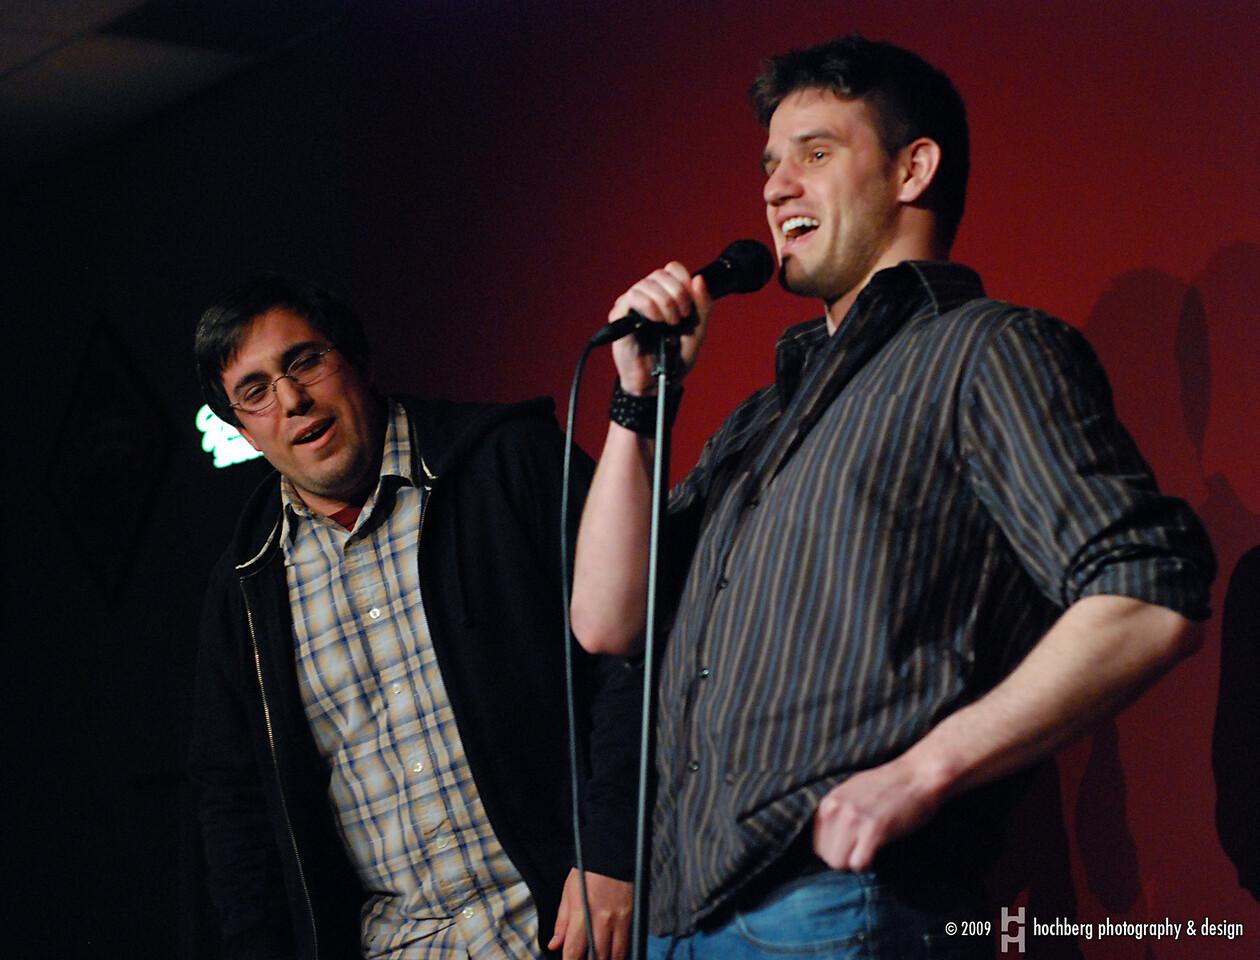 Patrick Bulger and Jesse Fernandez